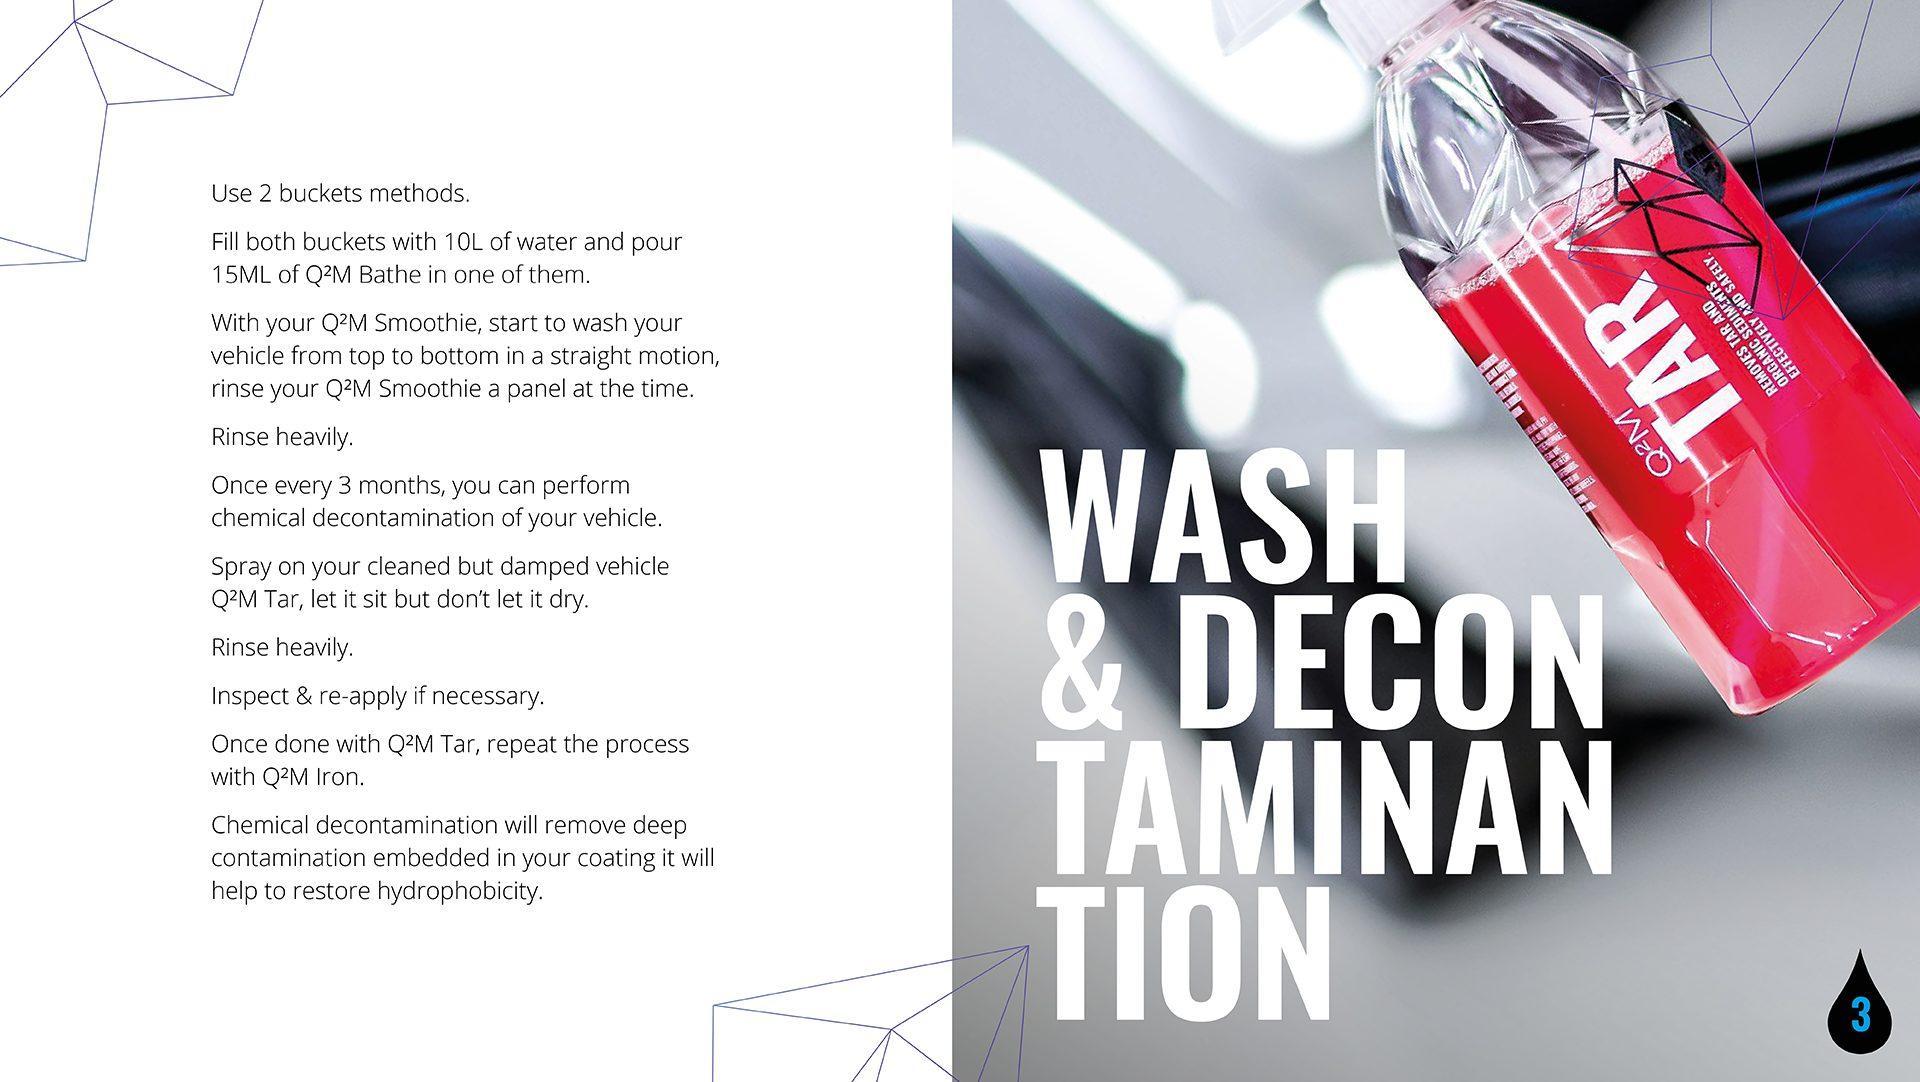 Wash and Decon Taminantion - GYEON maintenance